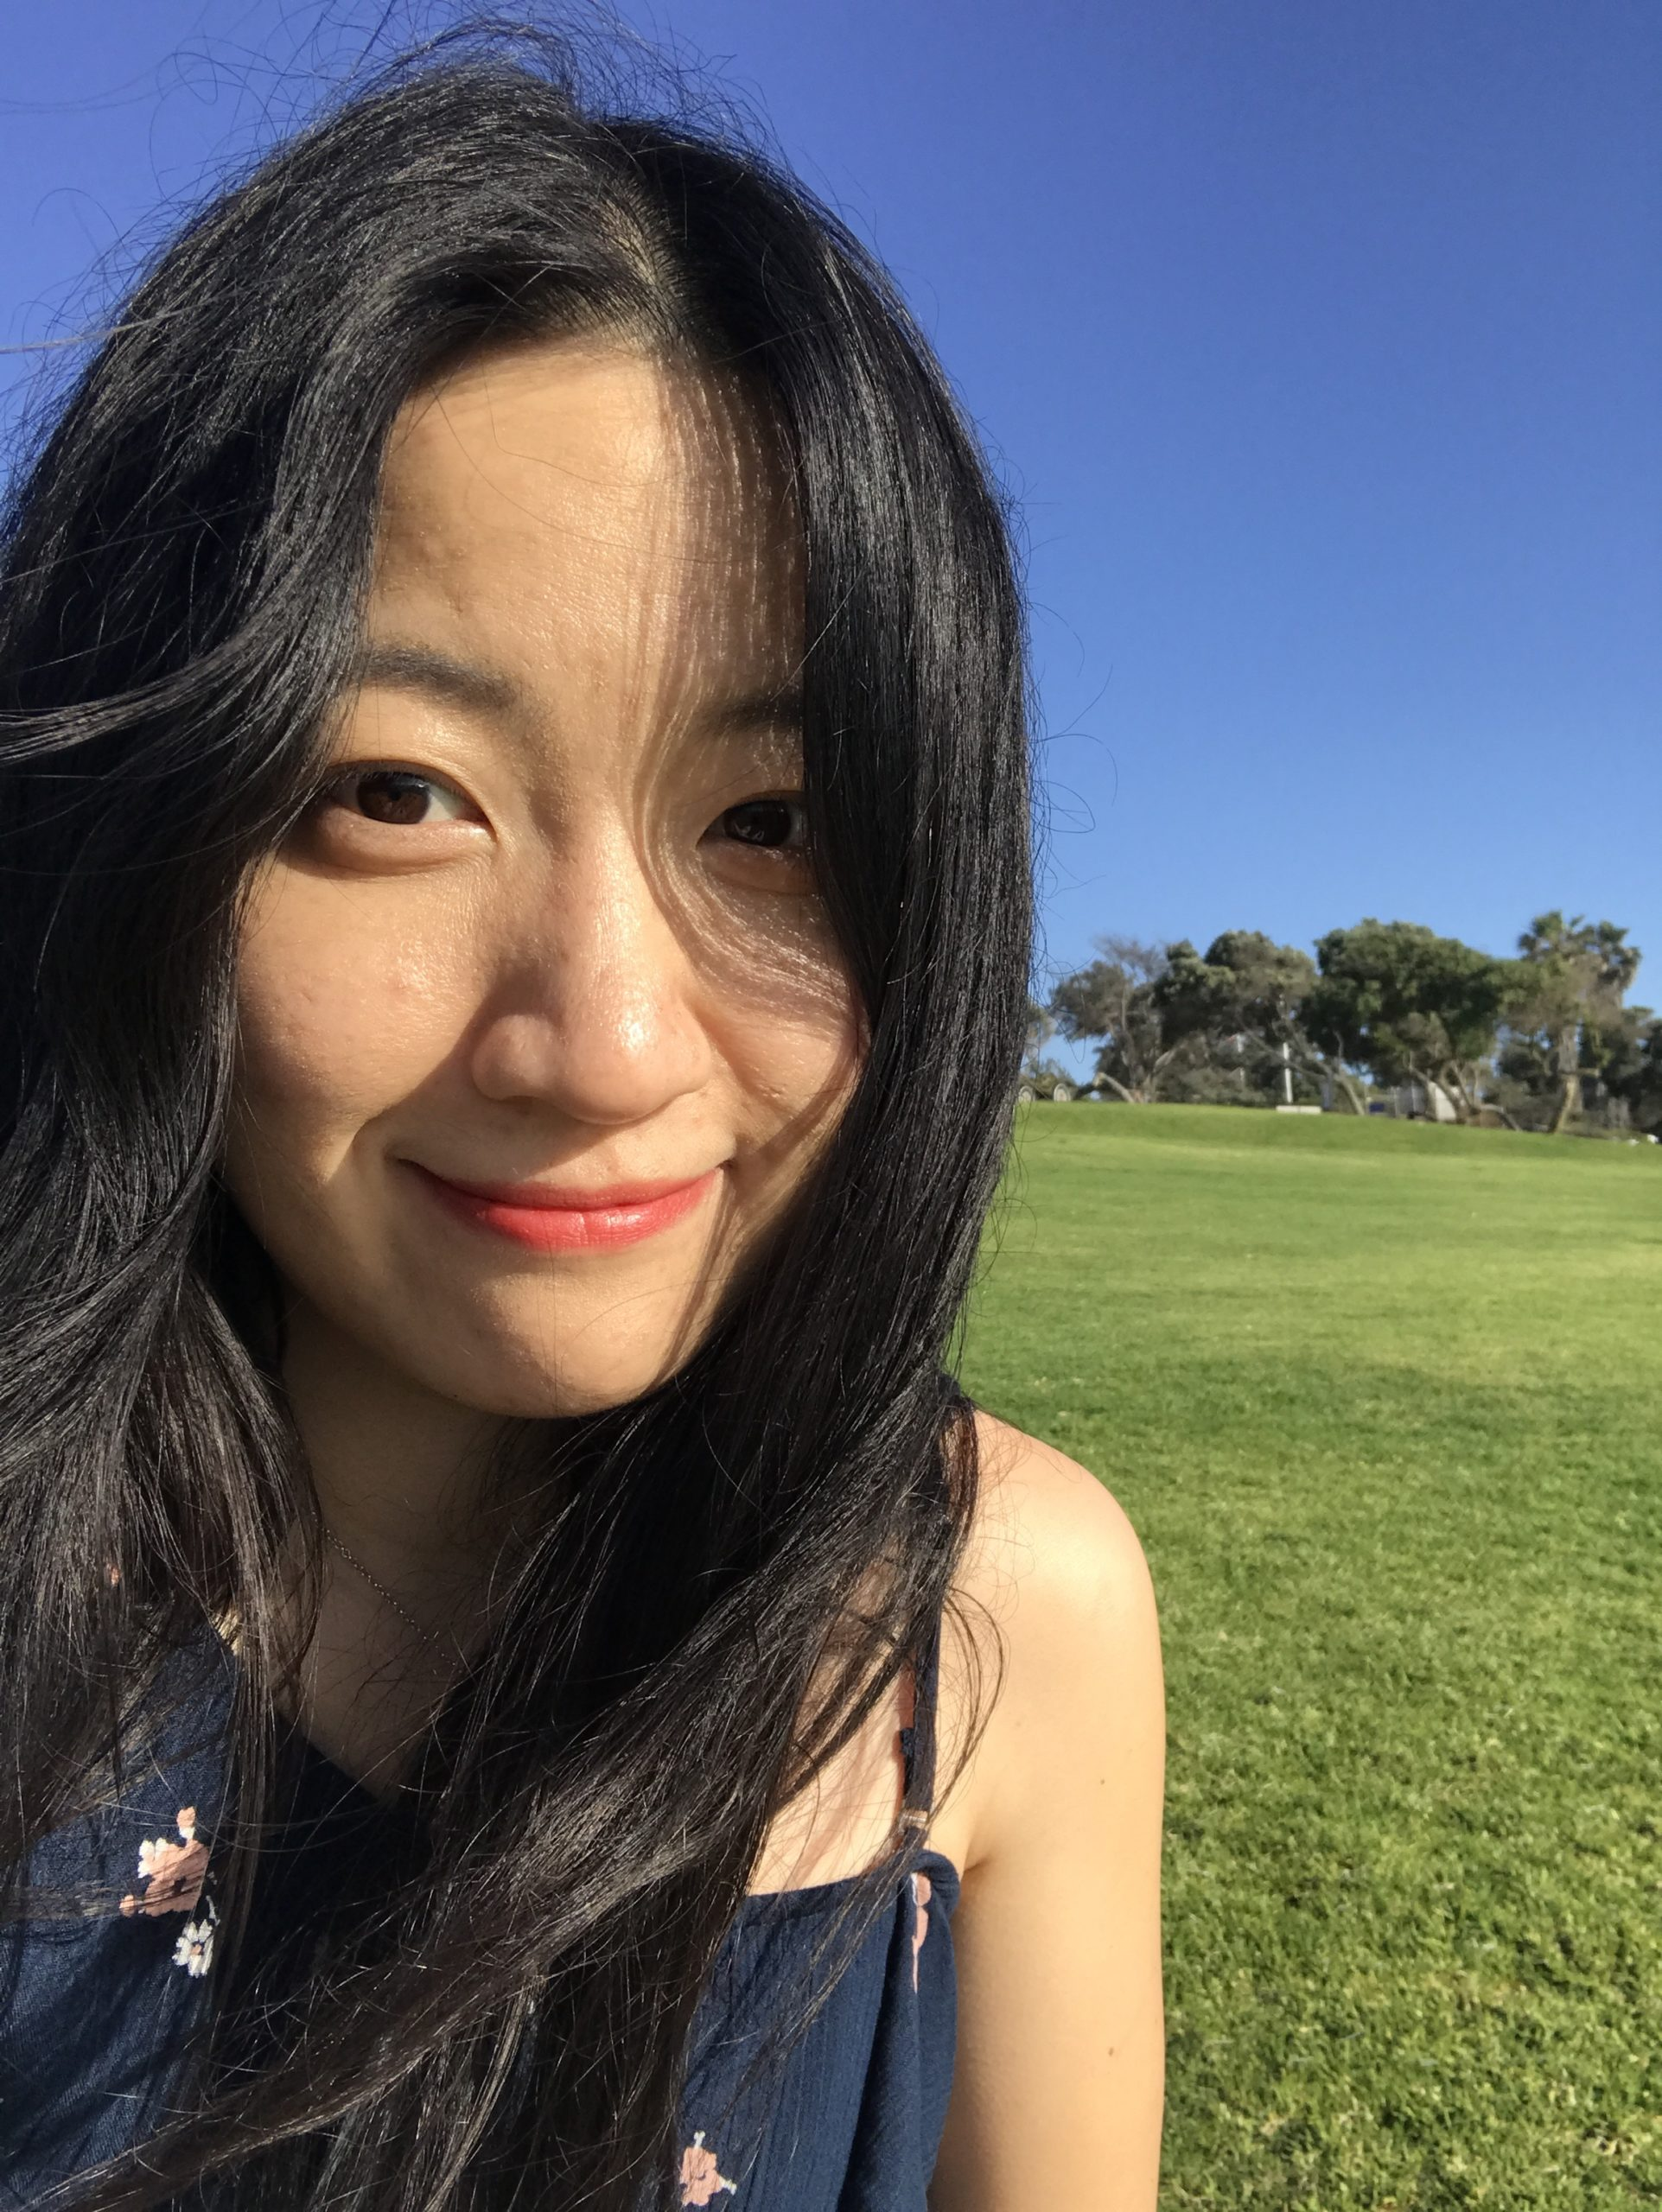 Rena Xie